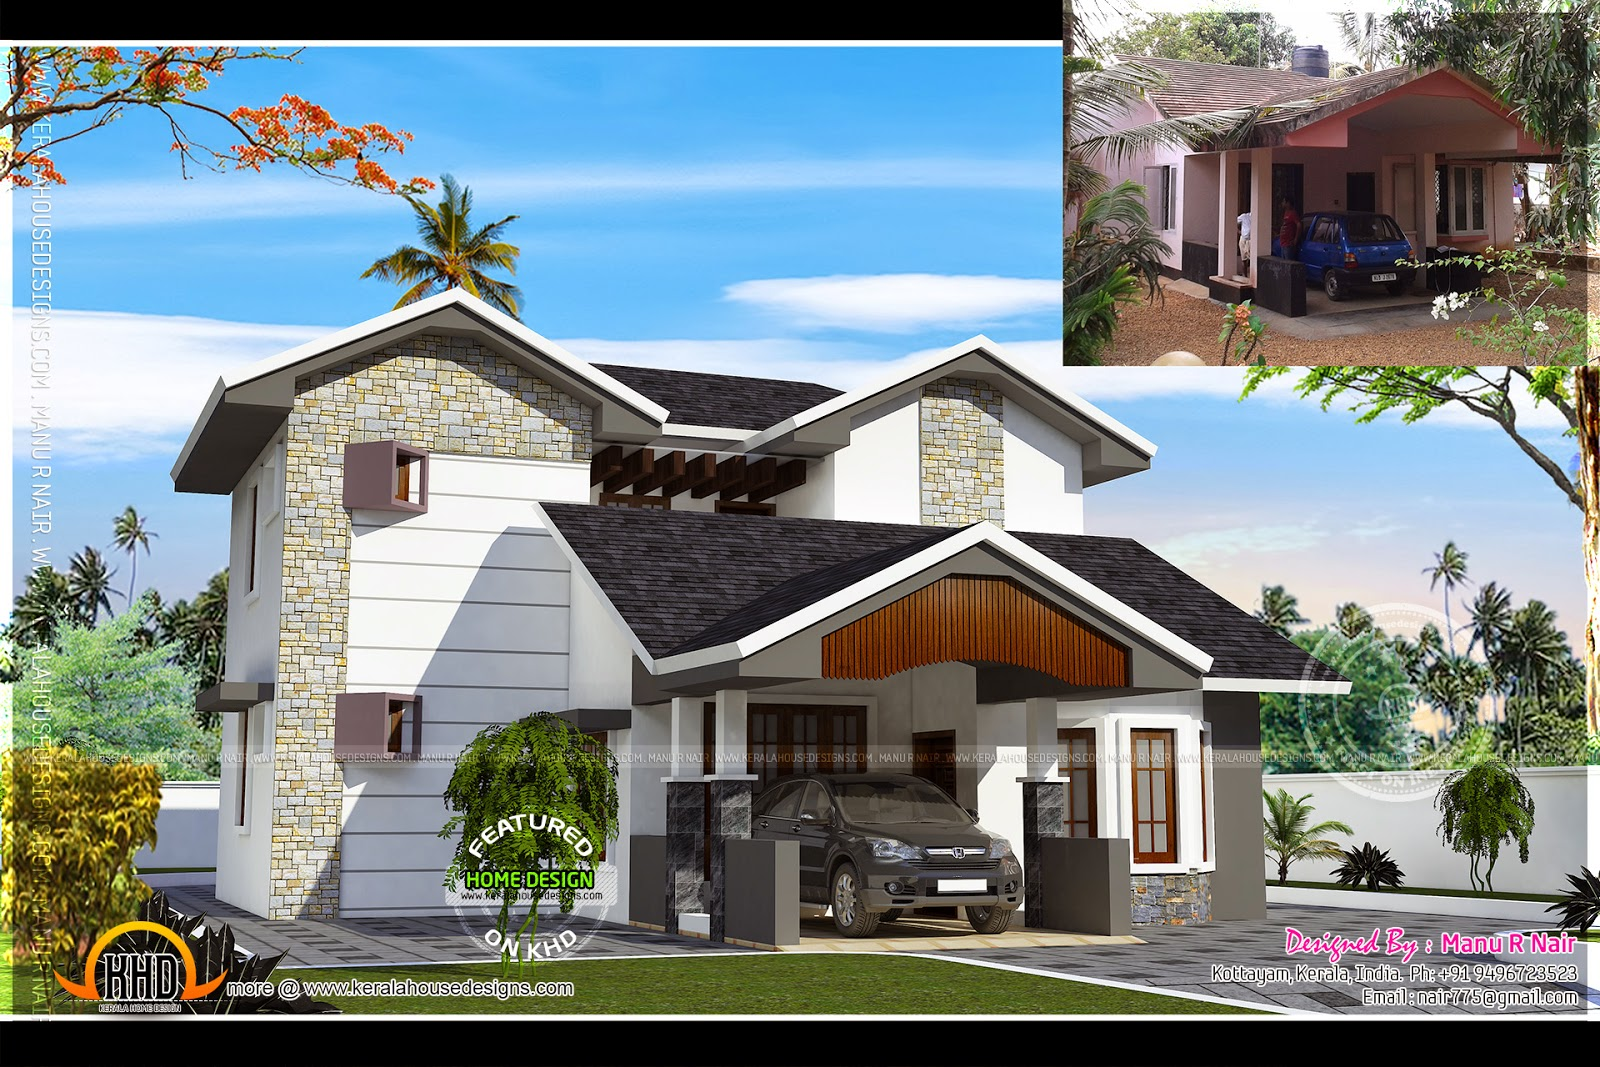 House Renovation In Ettumanoor, Kerala